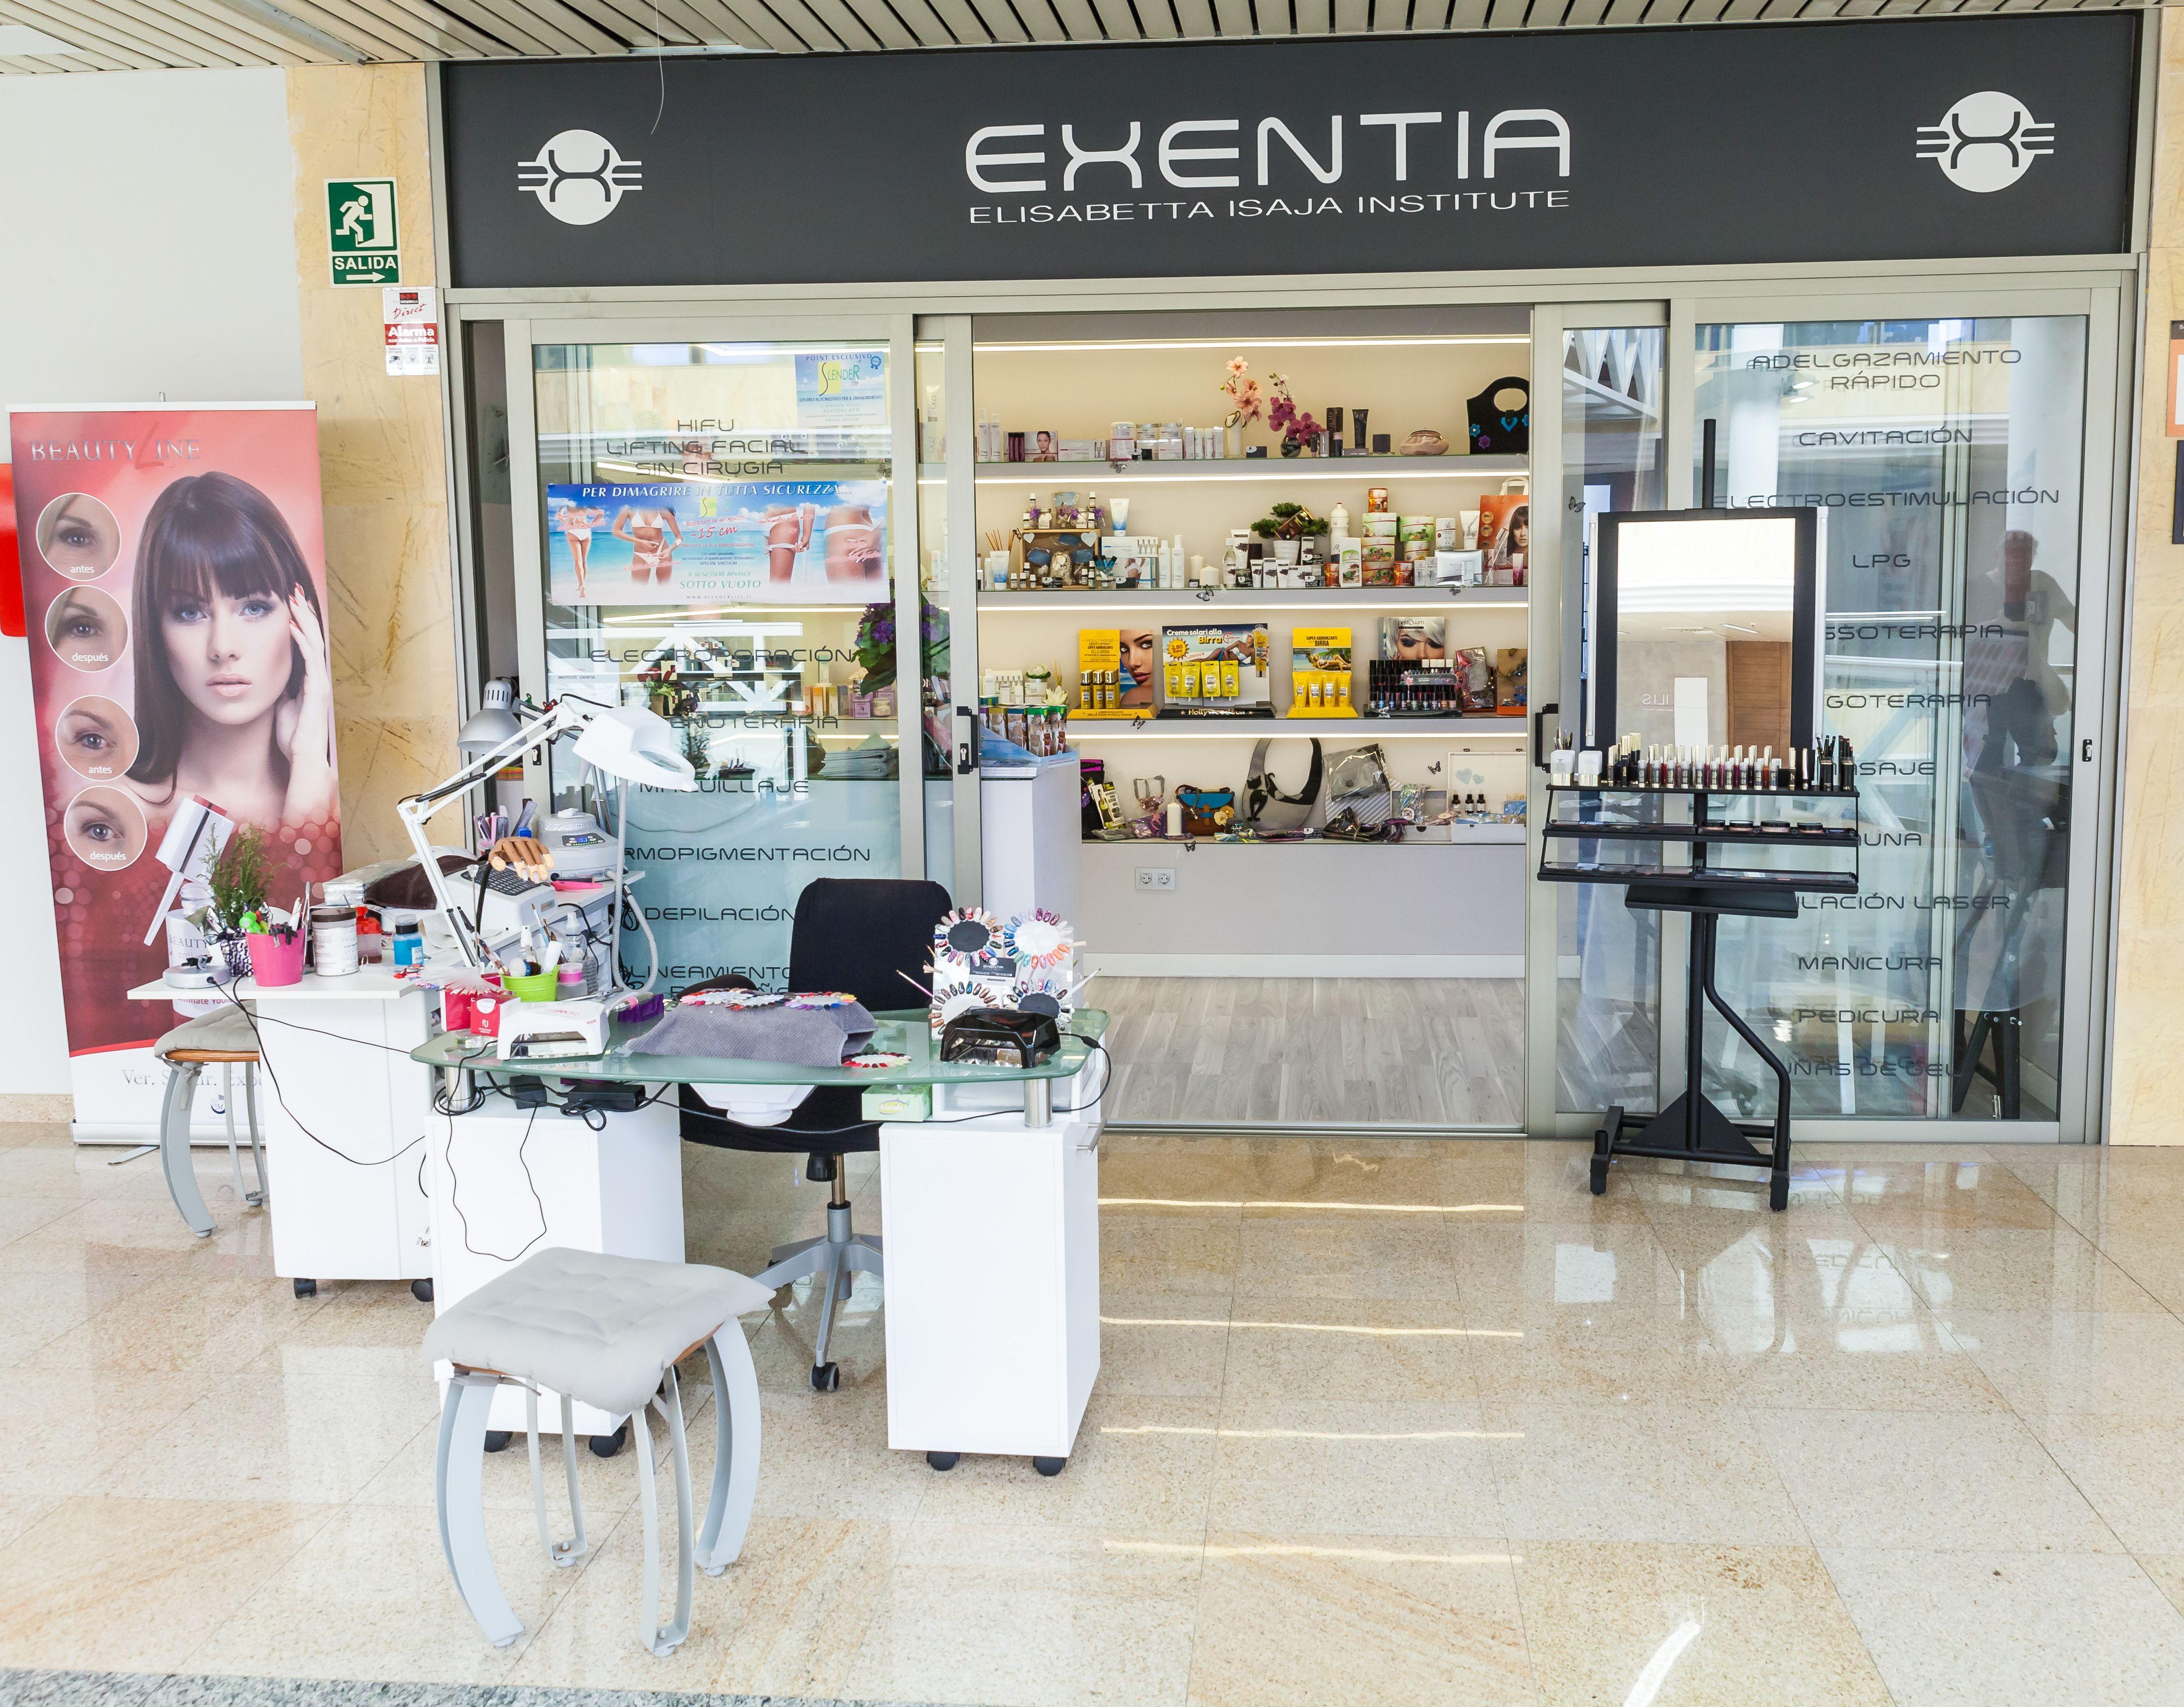 En Exentia ofrecemos un servicio de estética integral avanzada